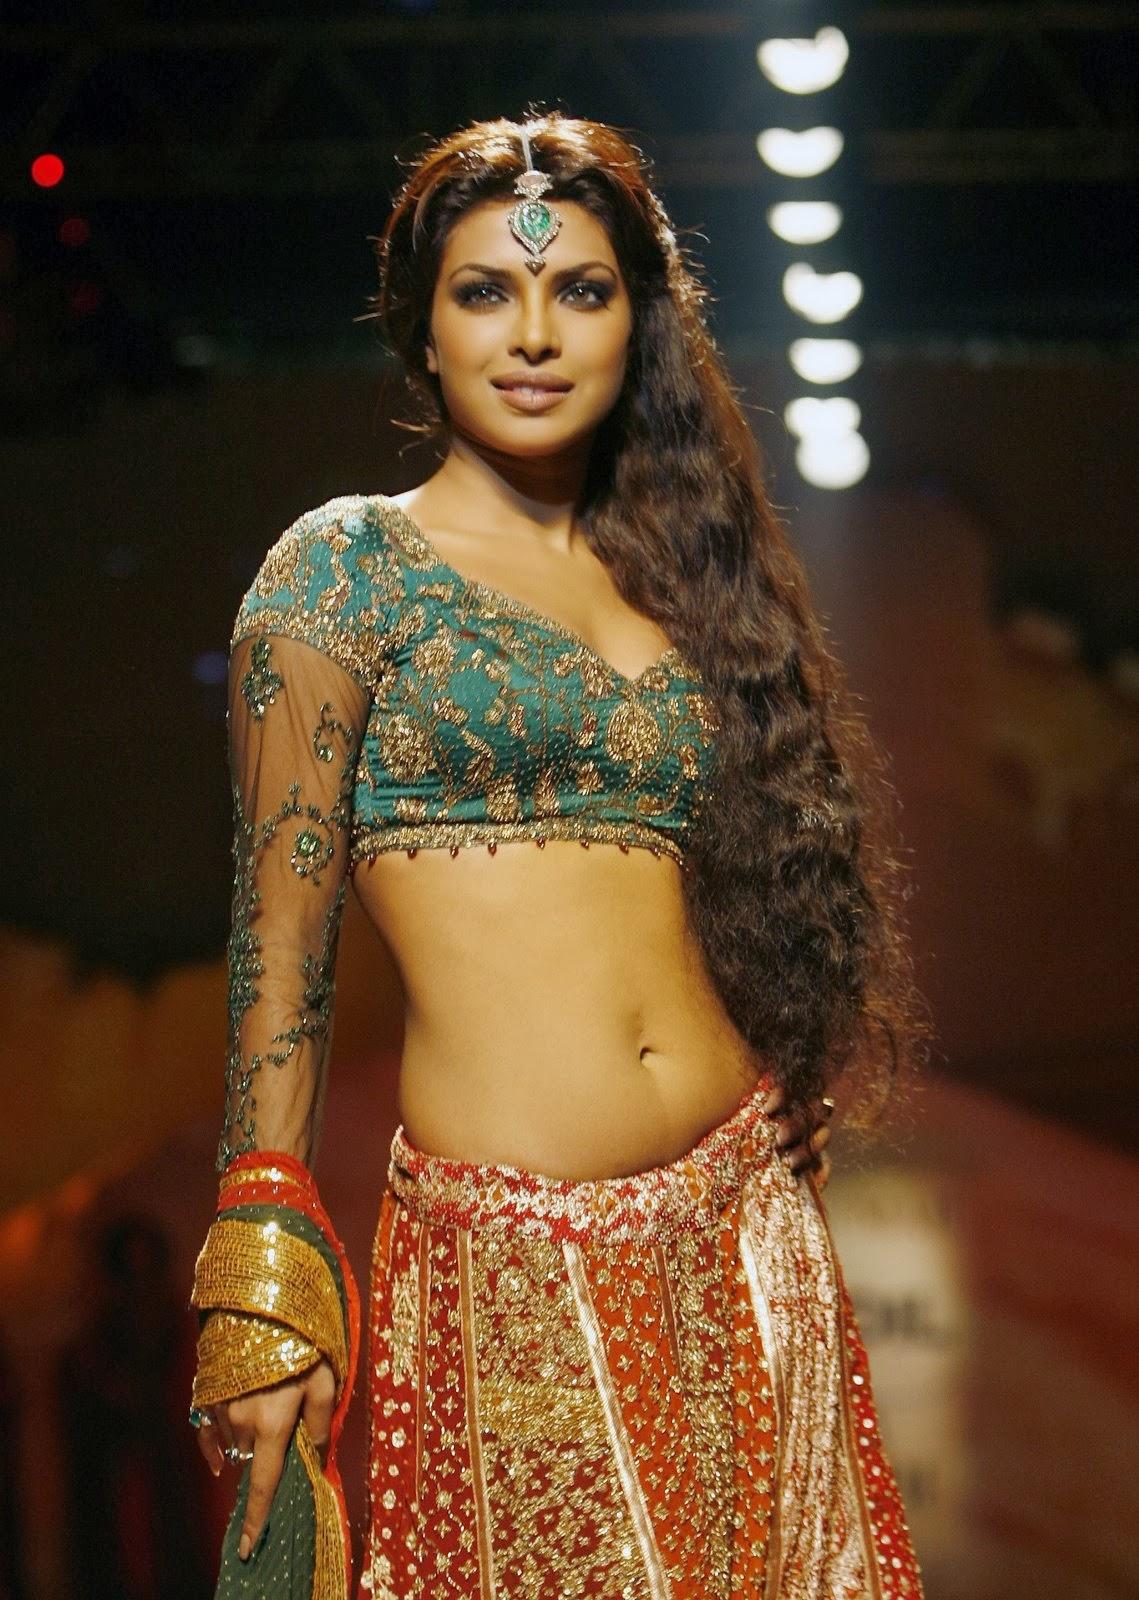 Priyanka Chopra Ki Sexy Video Hd